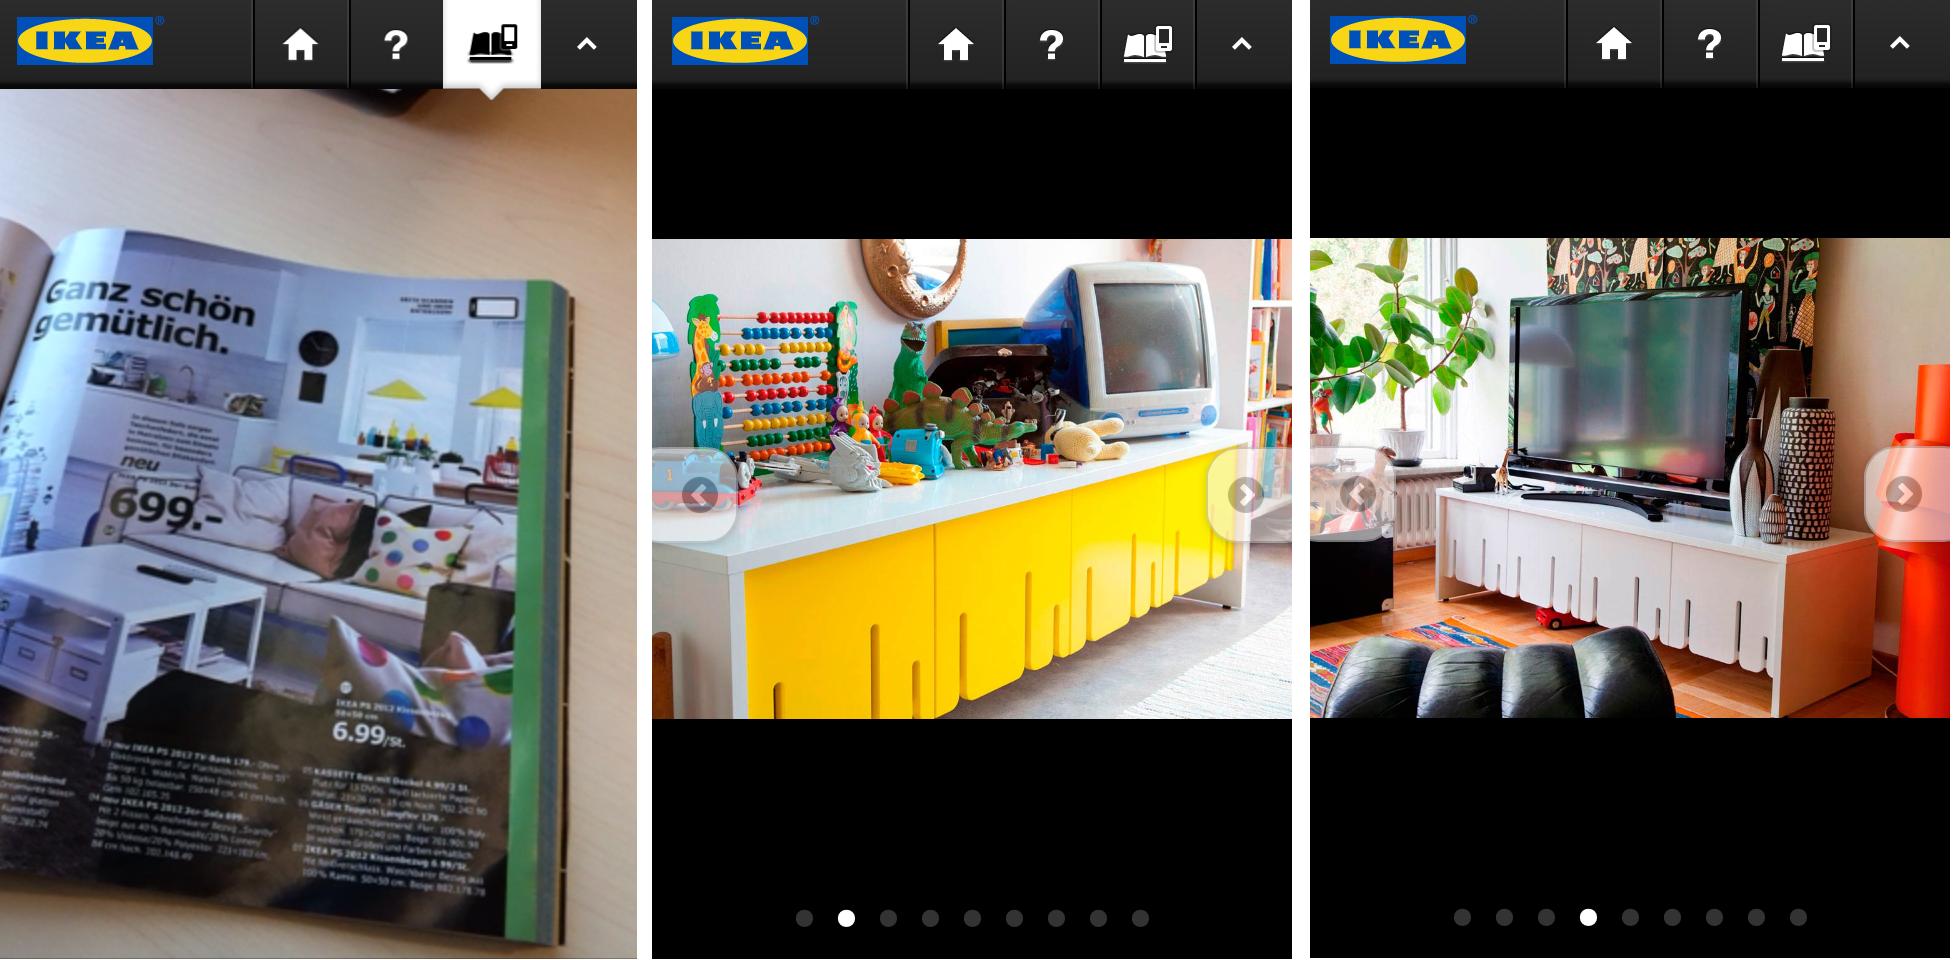 die neue ikea katalog app augmented reality im hausfrauen. Black Bedroom Furniture Sets. Home Design Ideas